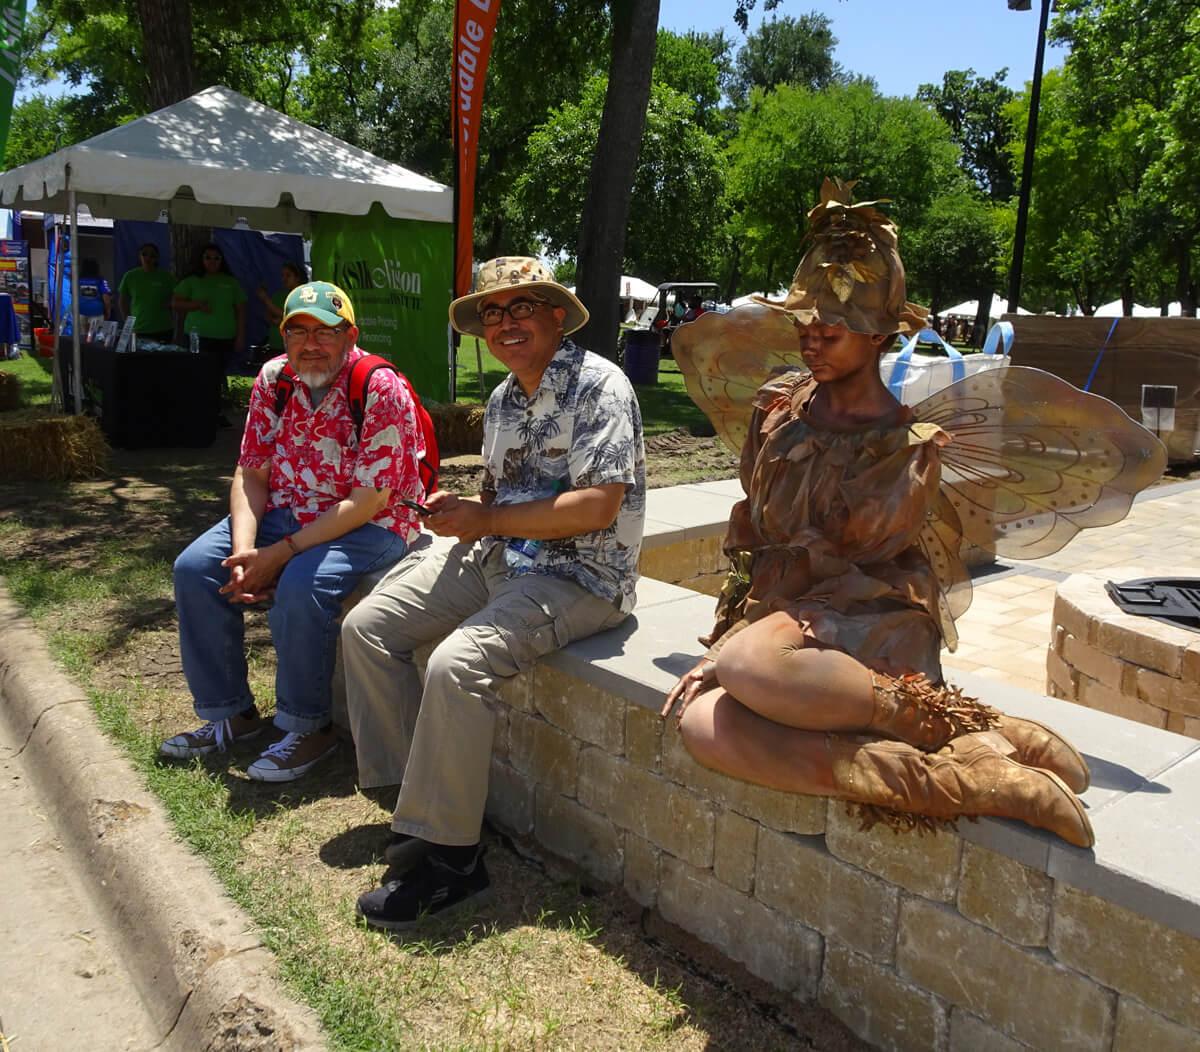 Fairy statue with men